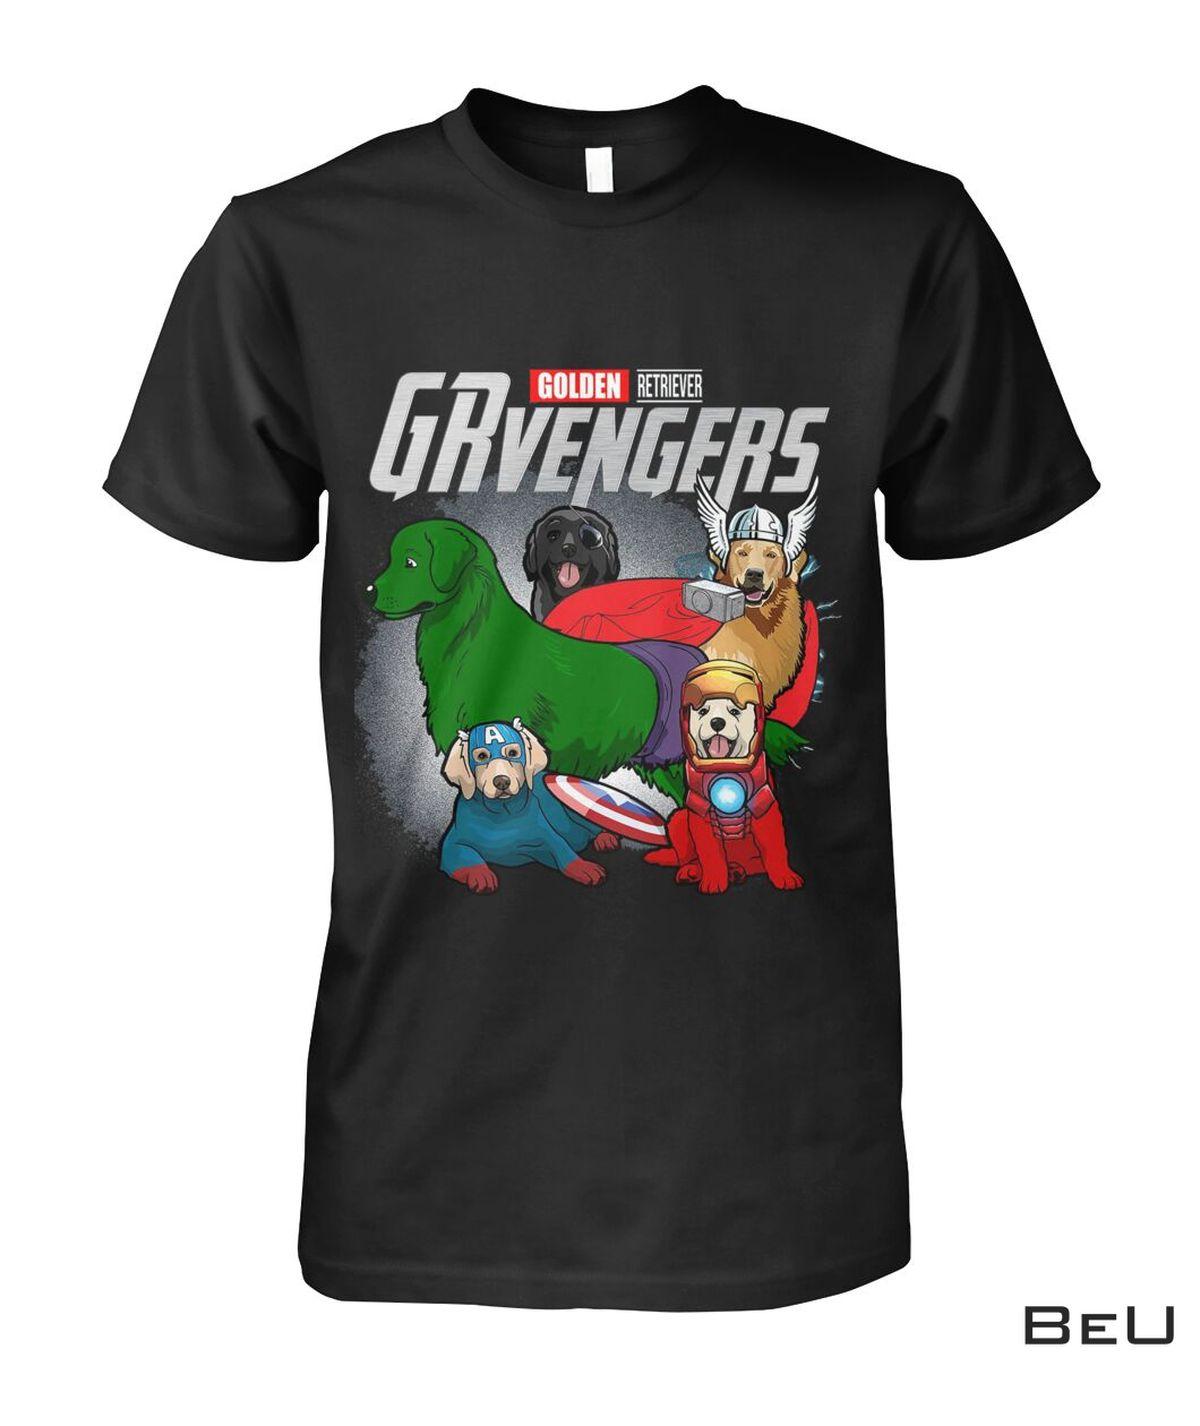 Golden Retriever GRvengers Avengers Shirt